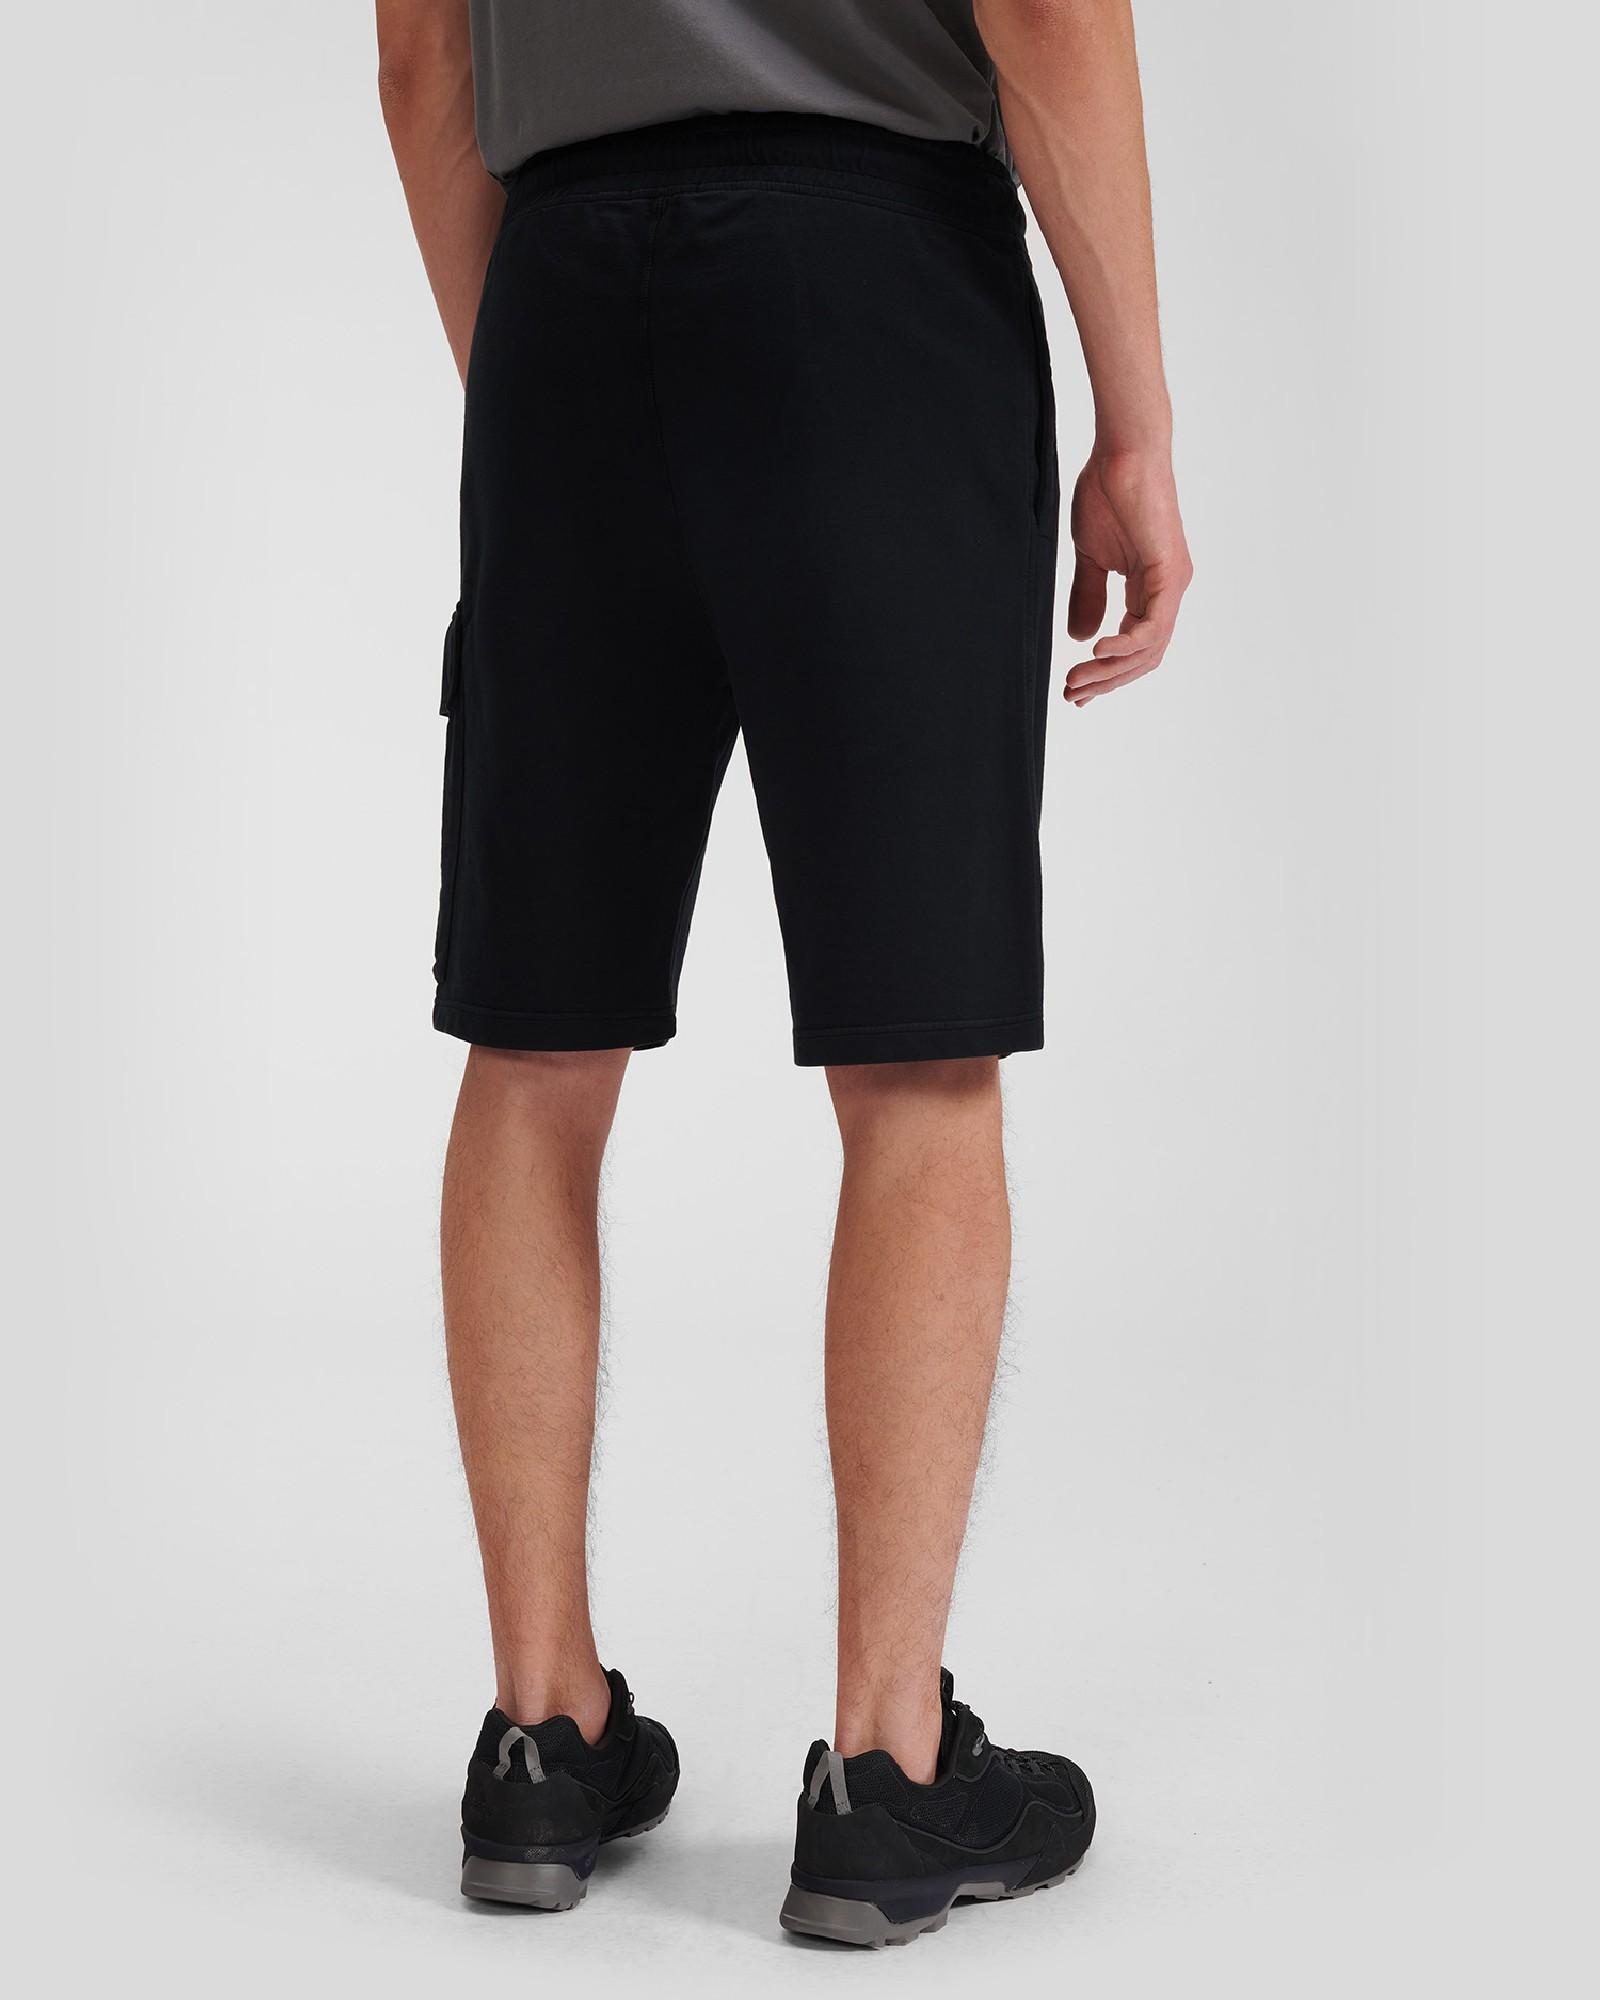 Pantaloncino Sportivo C.P. COMPANY | Bermuda | MSB041A00 2246G999